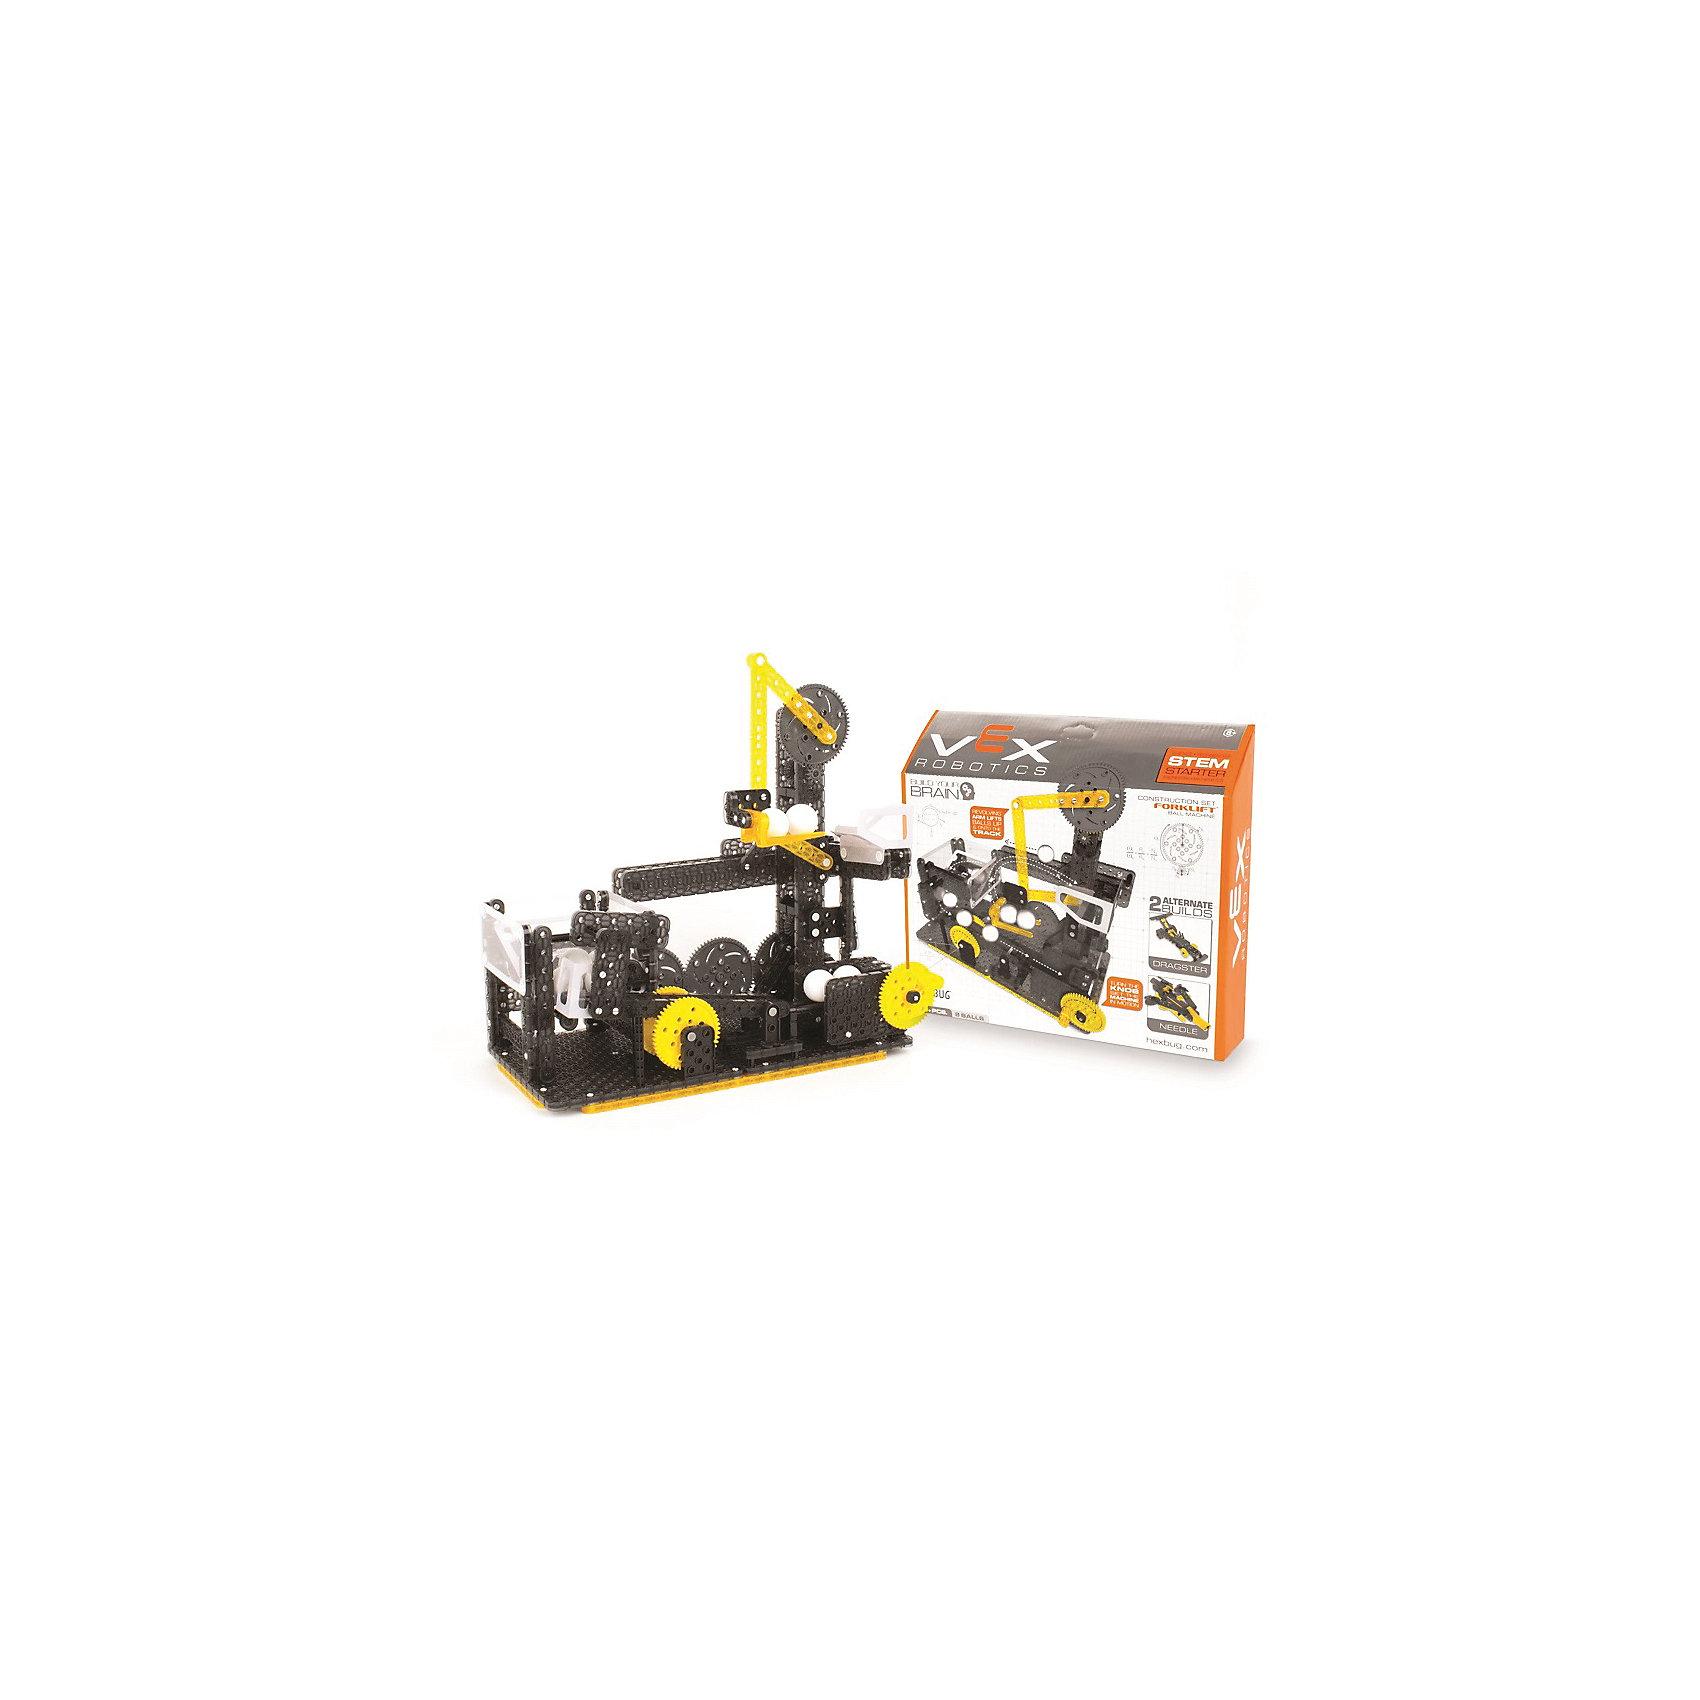 Конструктор VEX Forklift Ball Machine, 270 деталей, HexbugПластмассовые конструкторы<br><br><br>Ширина мм: 270<br>Глубина мм: 60<br>Высота мм: 230<br>Вес г: 897<br>Возраст от месяцев: 36<br>Возраст до месяцев: 2147483647<br>Пол: Унисекс<br>Возраст: Детский<br>SKU: 5507206